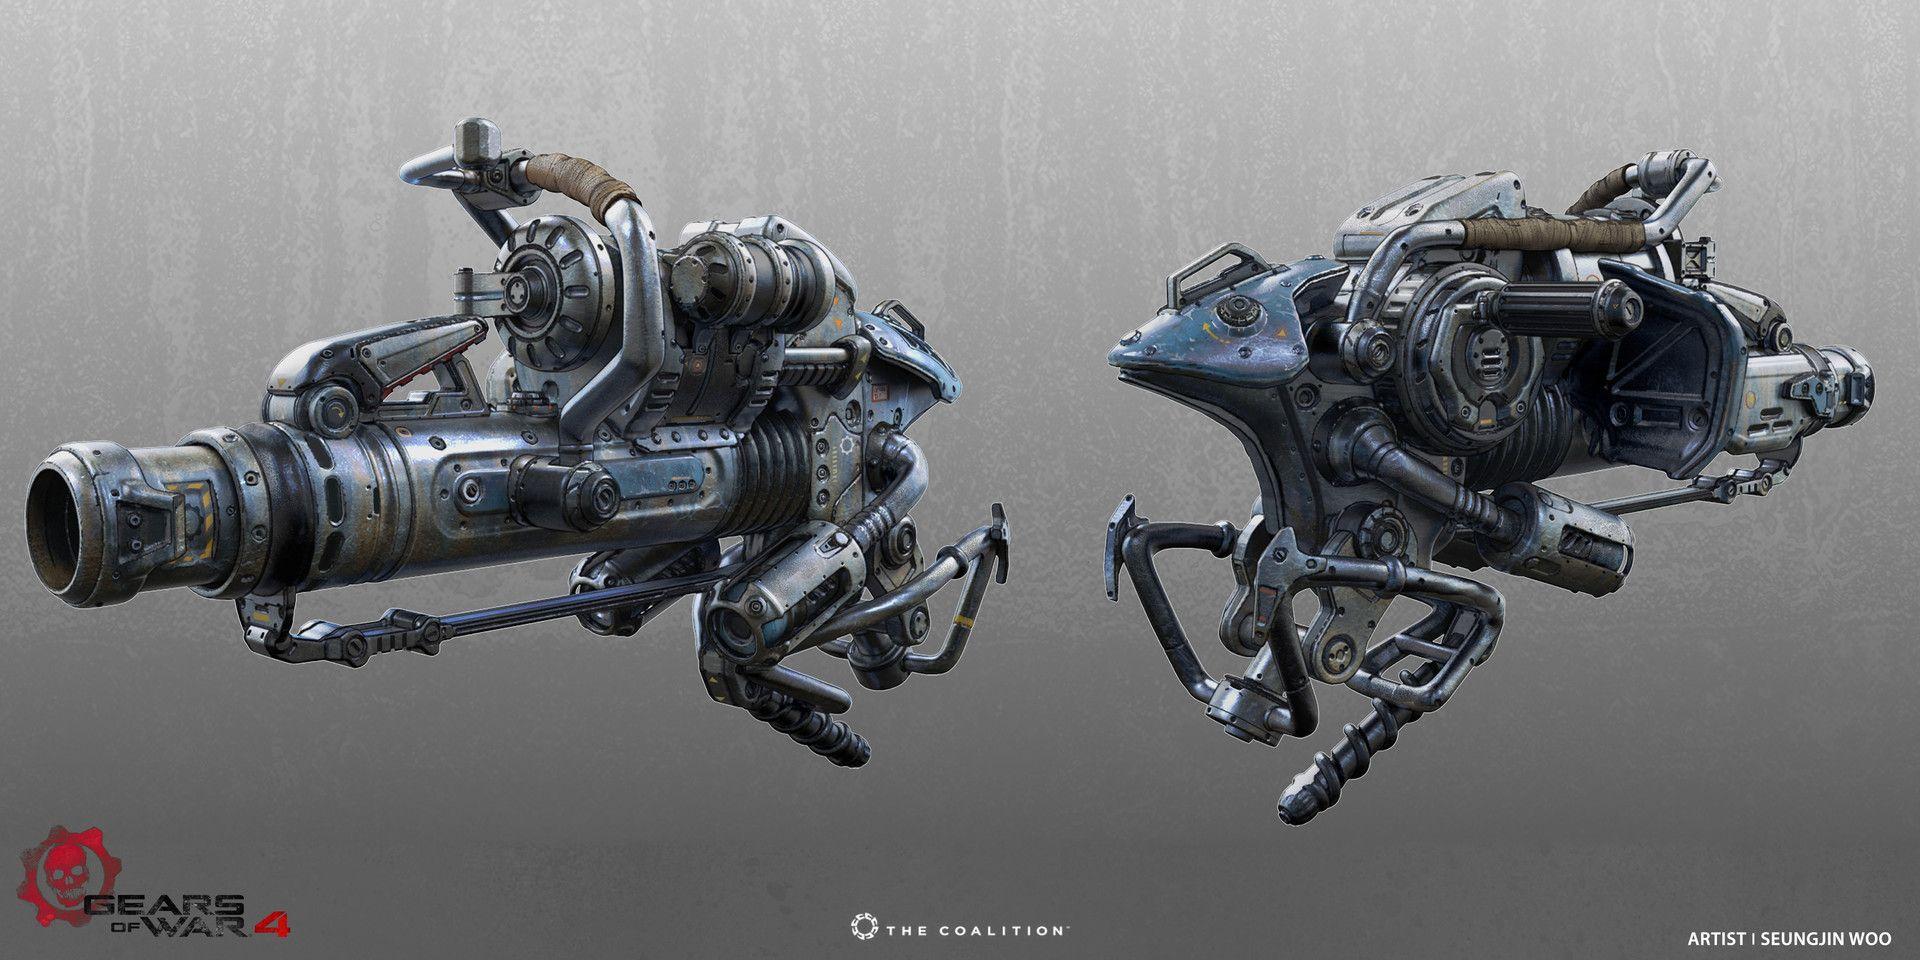 Artstation Gears Of War 4 Mortar Update Seungjin Woo Gears Of War Space Crafts Mortar